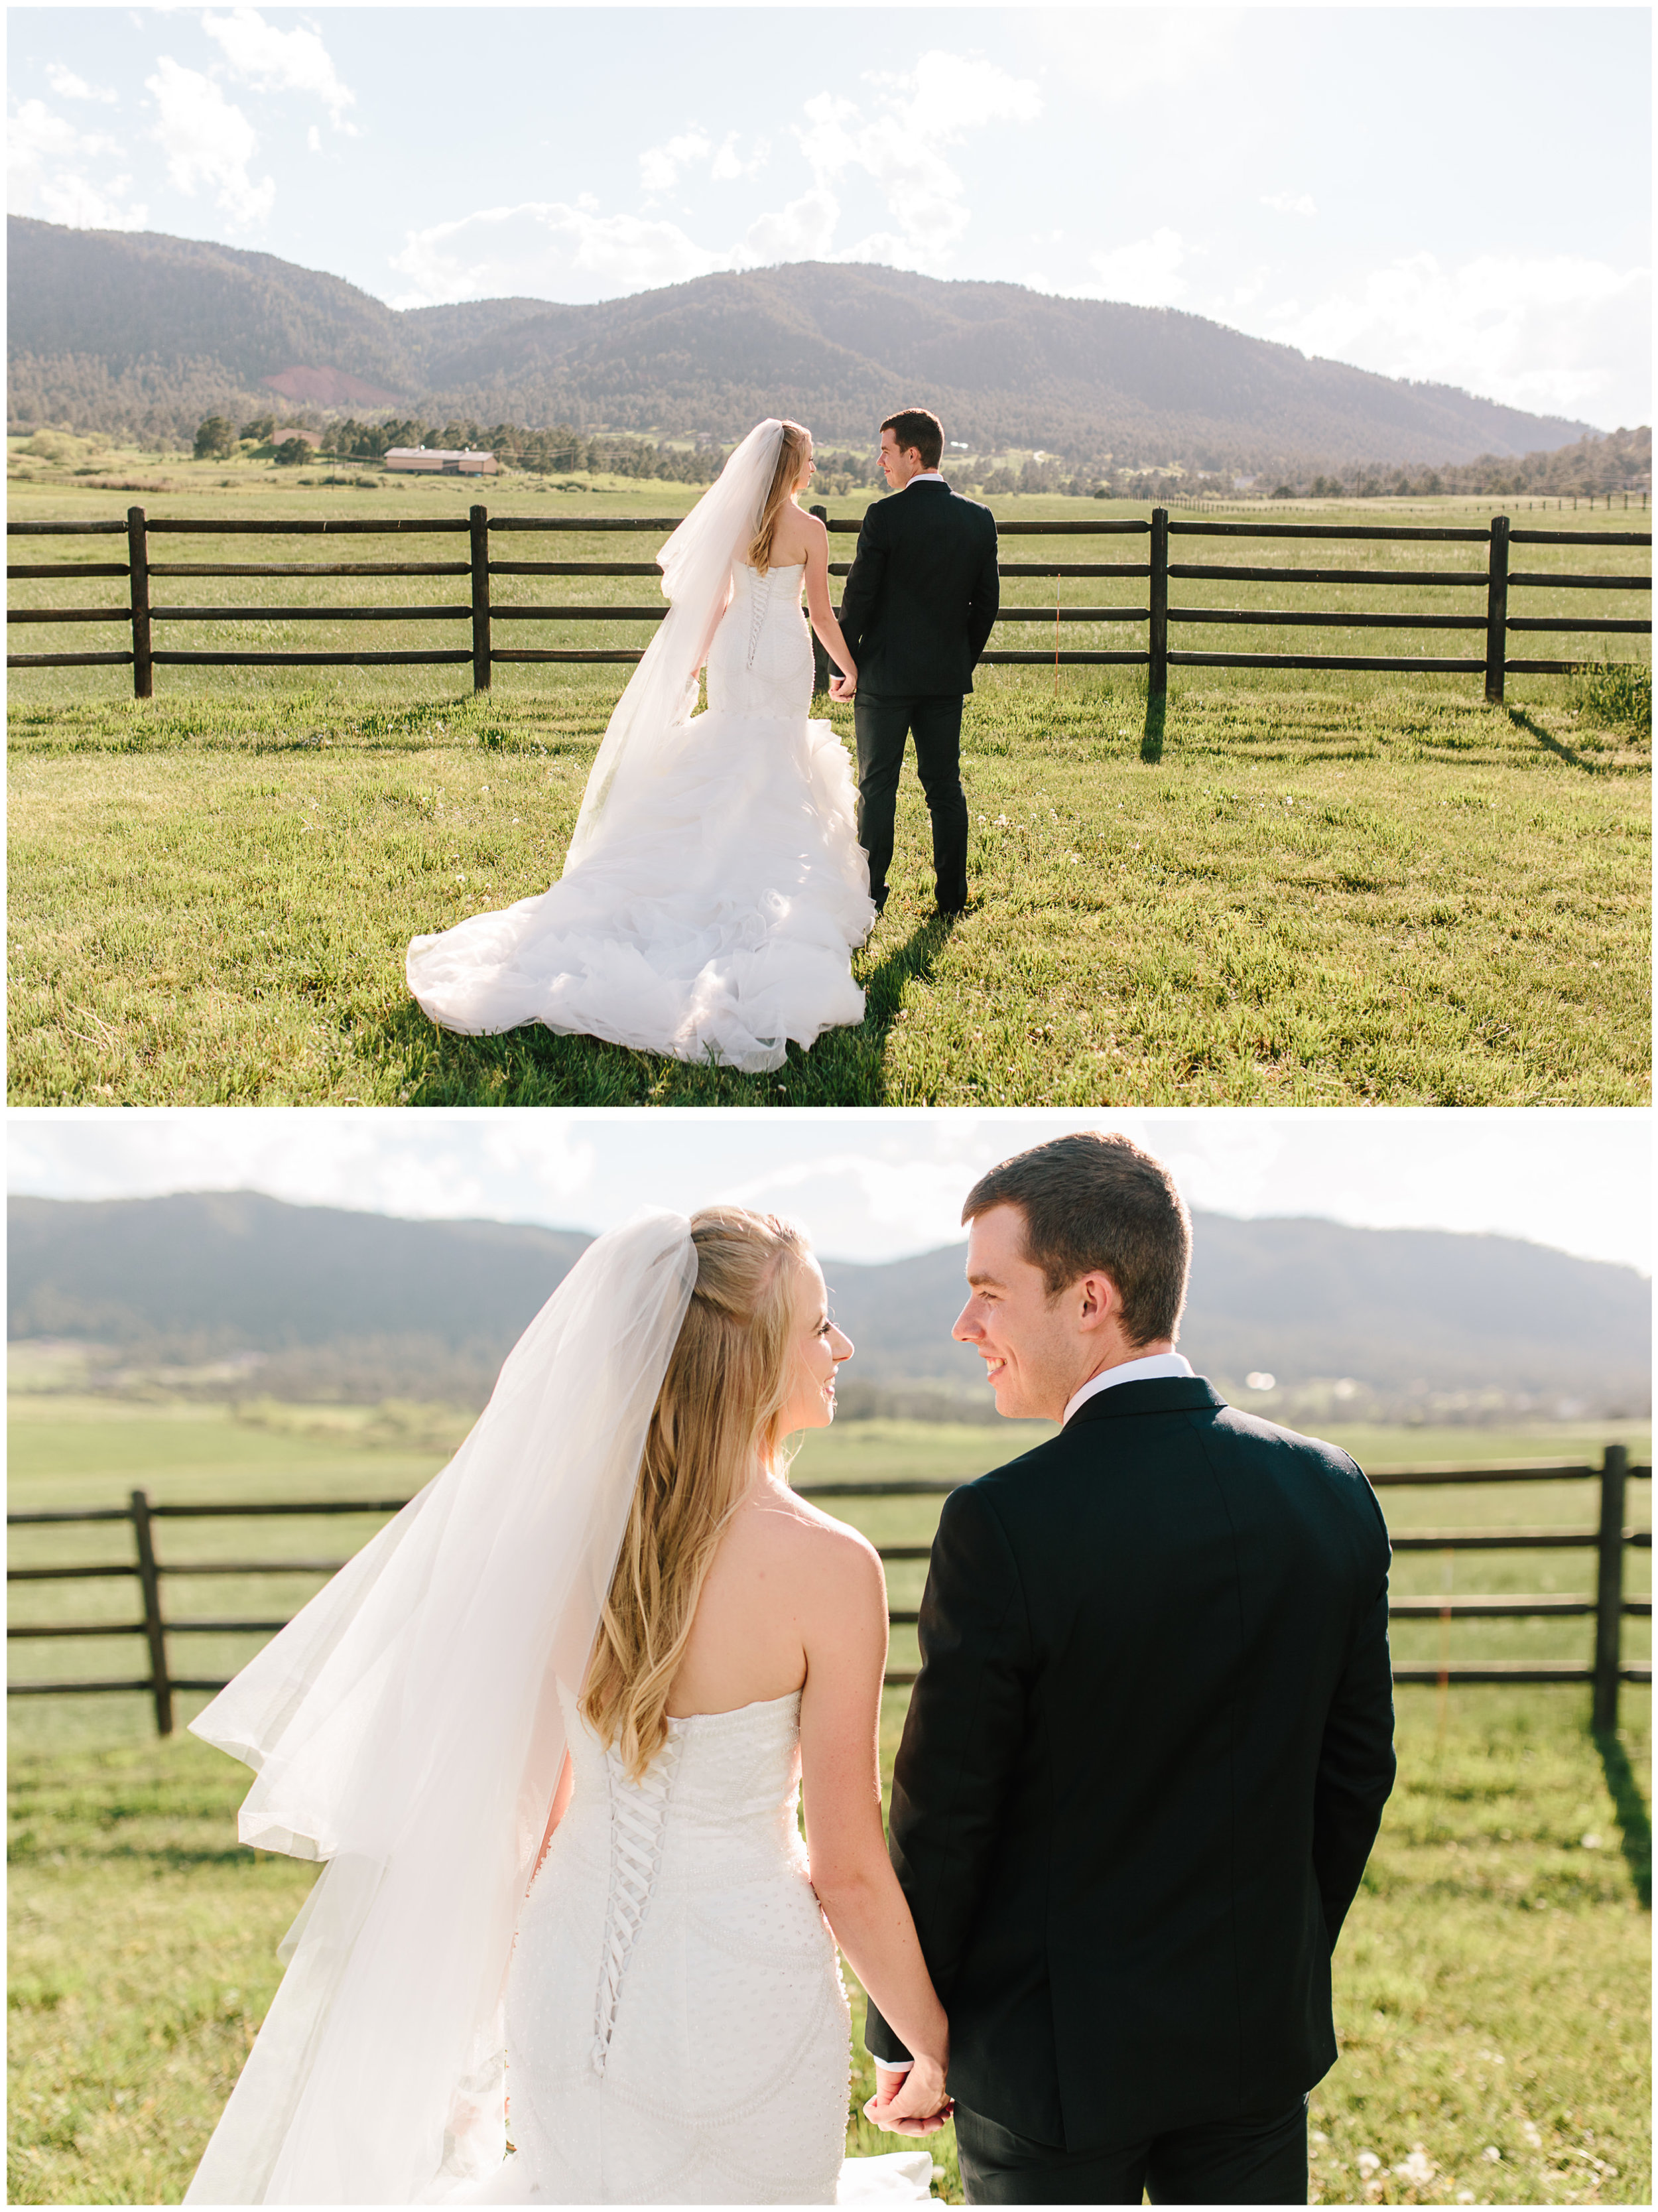 spruce_mountain_ranch_wedding_39.jpg